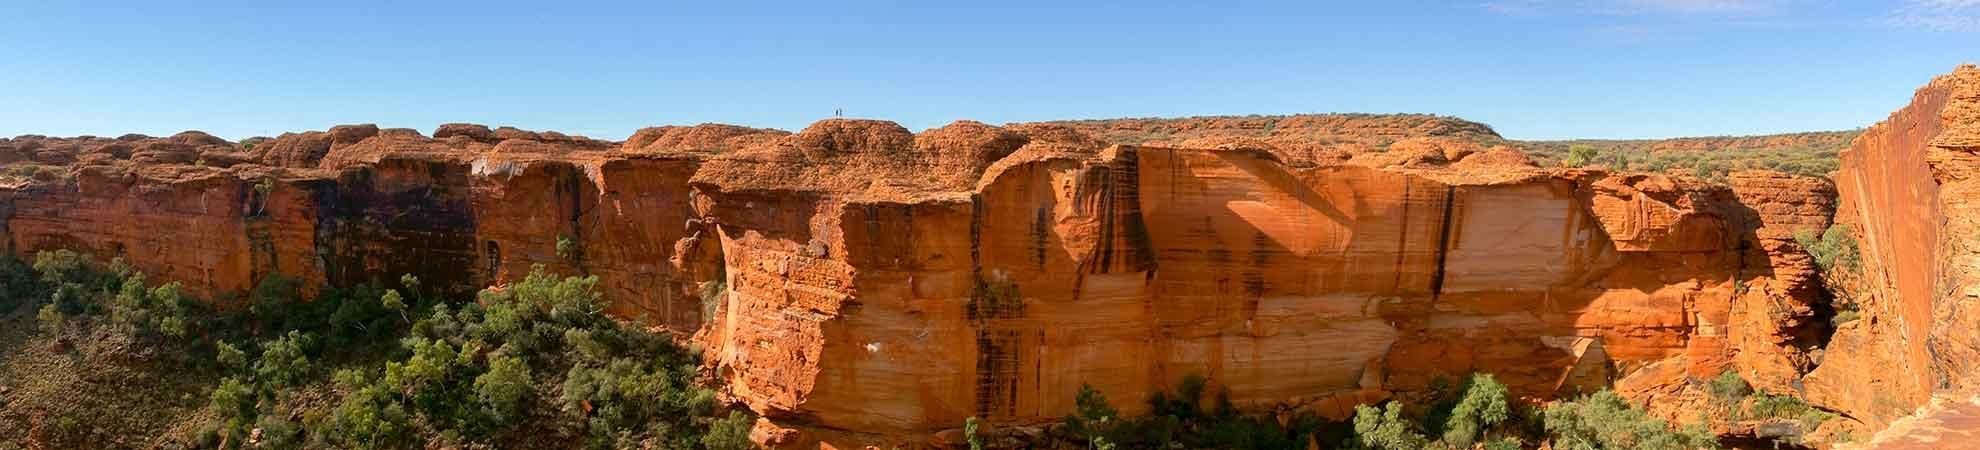 Voyage Uluru